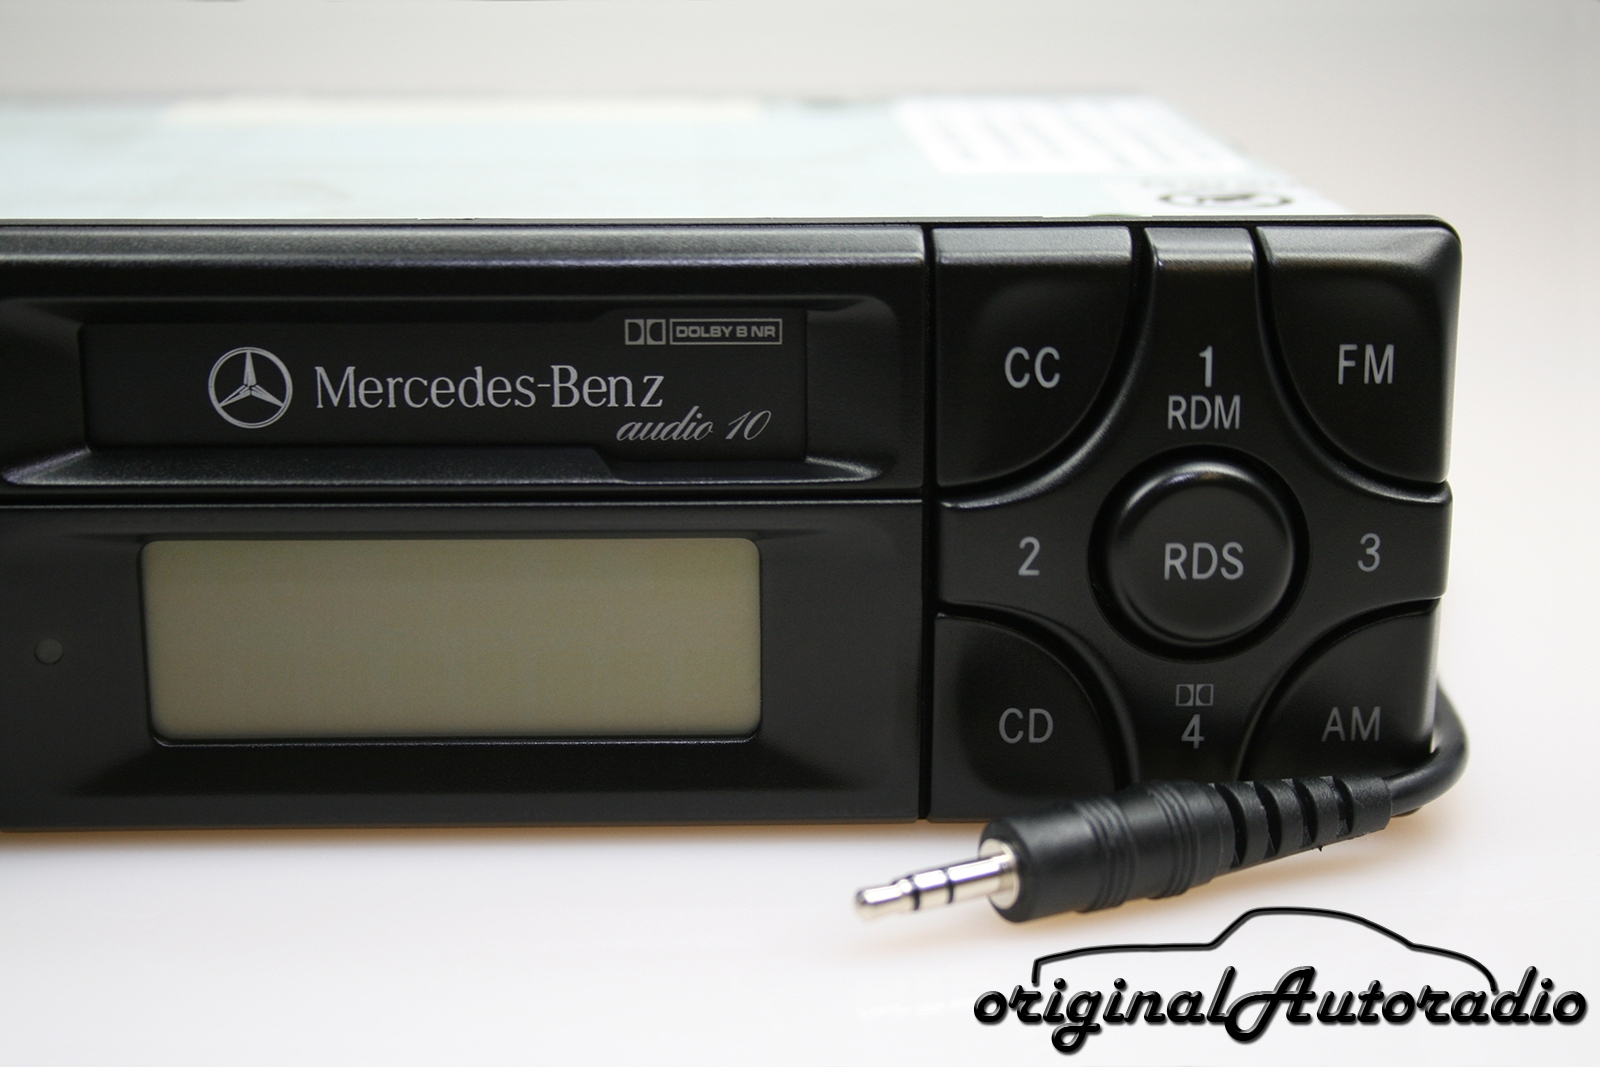 mercedes audio 10 cassette manual 2019 ebook library. Black Bedroom Furniture Sets. Home Design Ideas